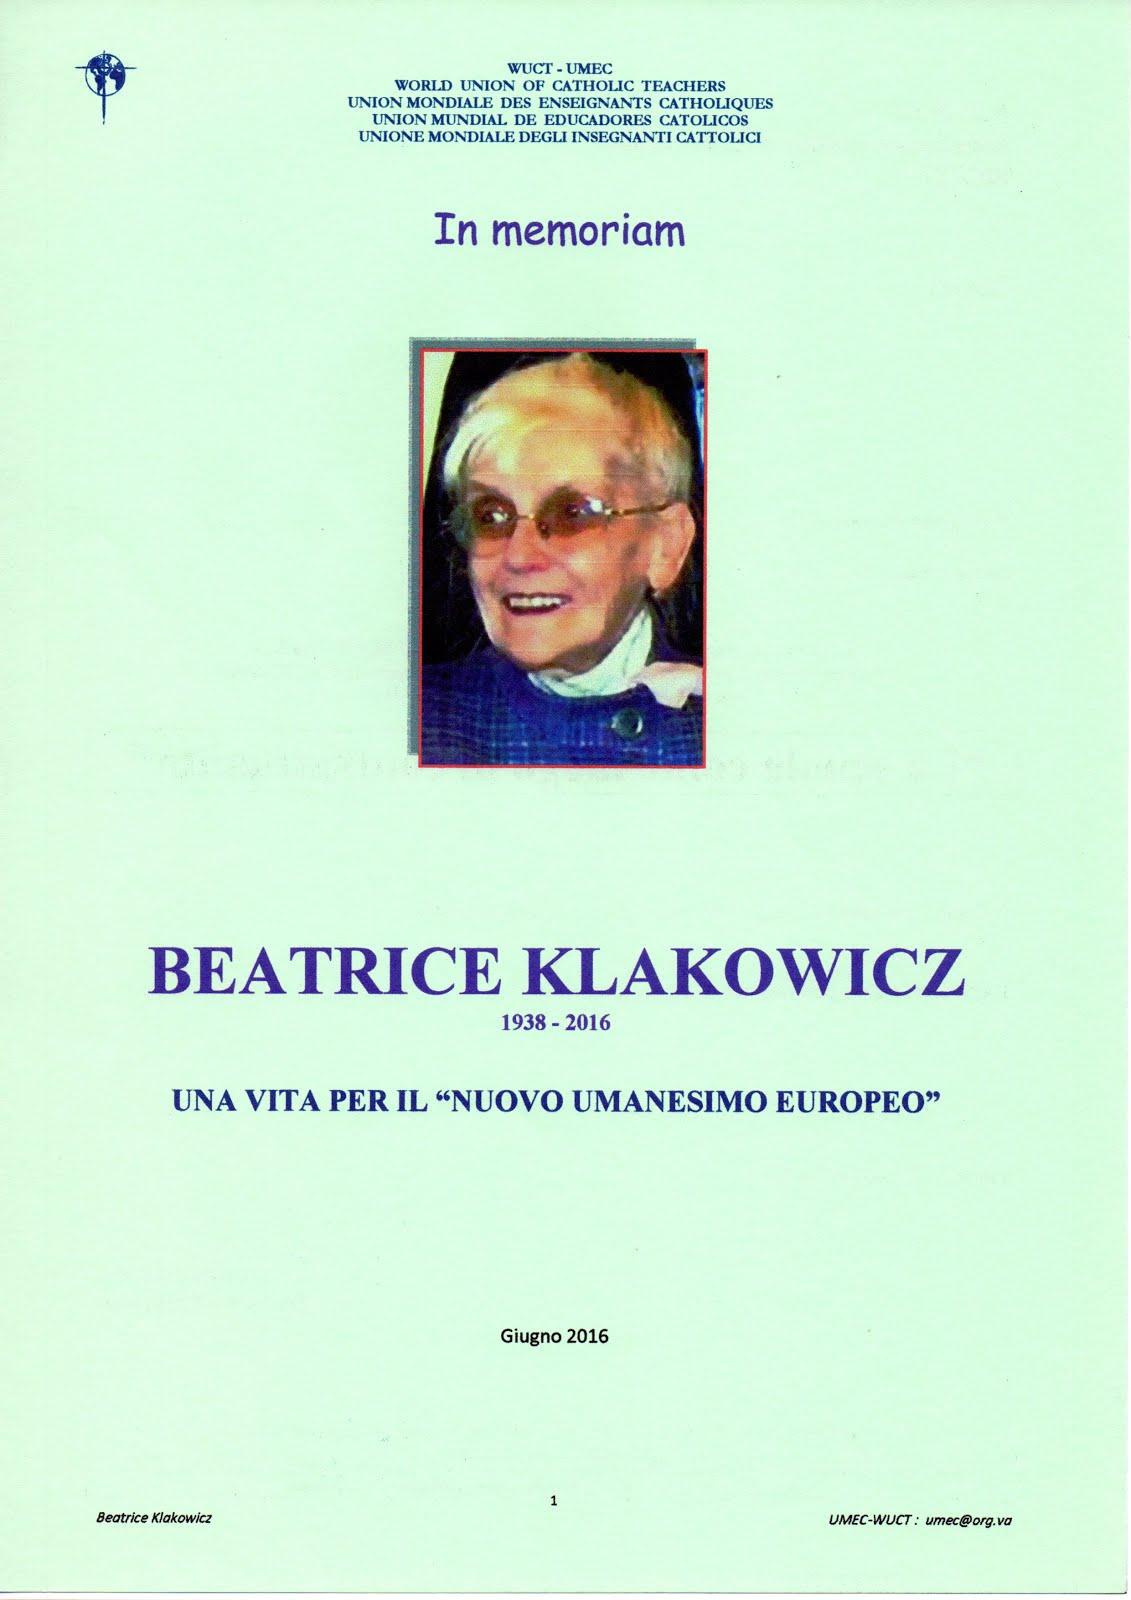 BEATRICE KLAKOWICZ - in memoriam